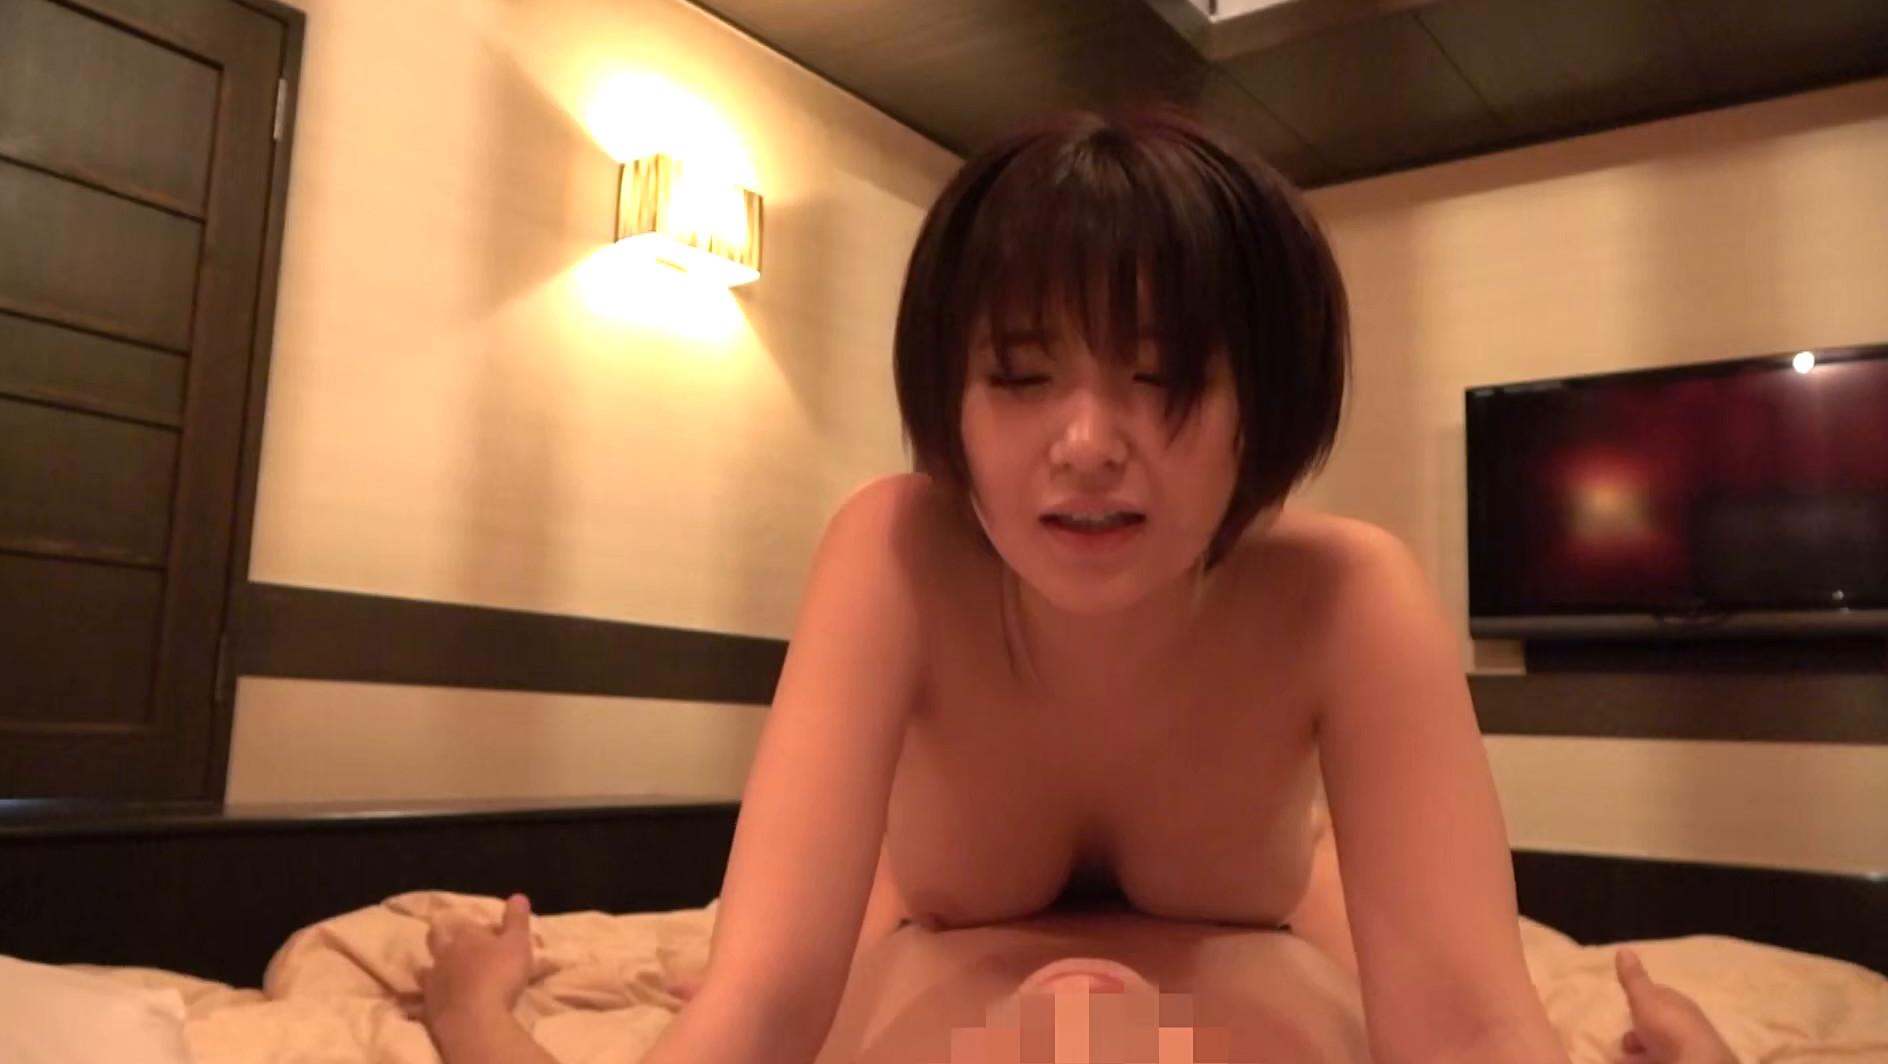 Fカップ巨乳女学生あっちゃんで女体盛りパフェ,のサンプル画像26